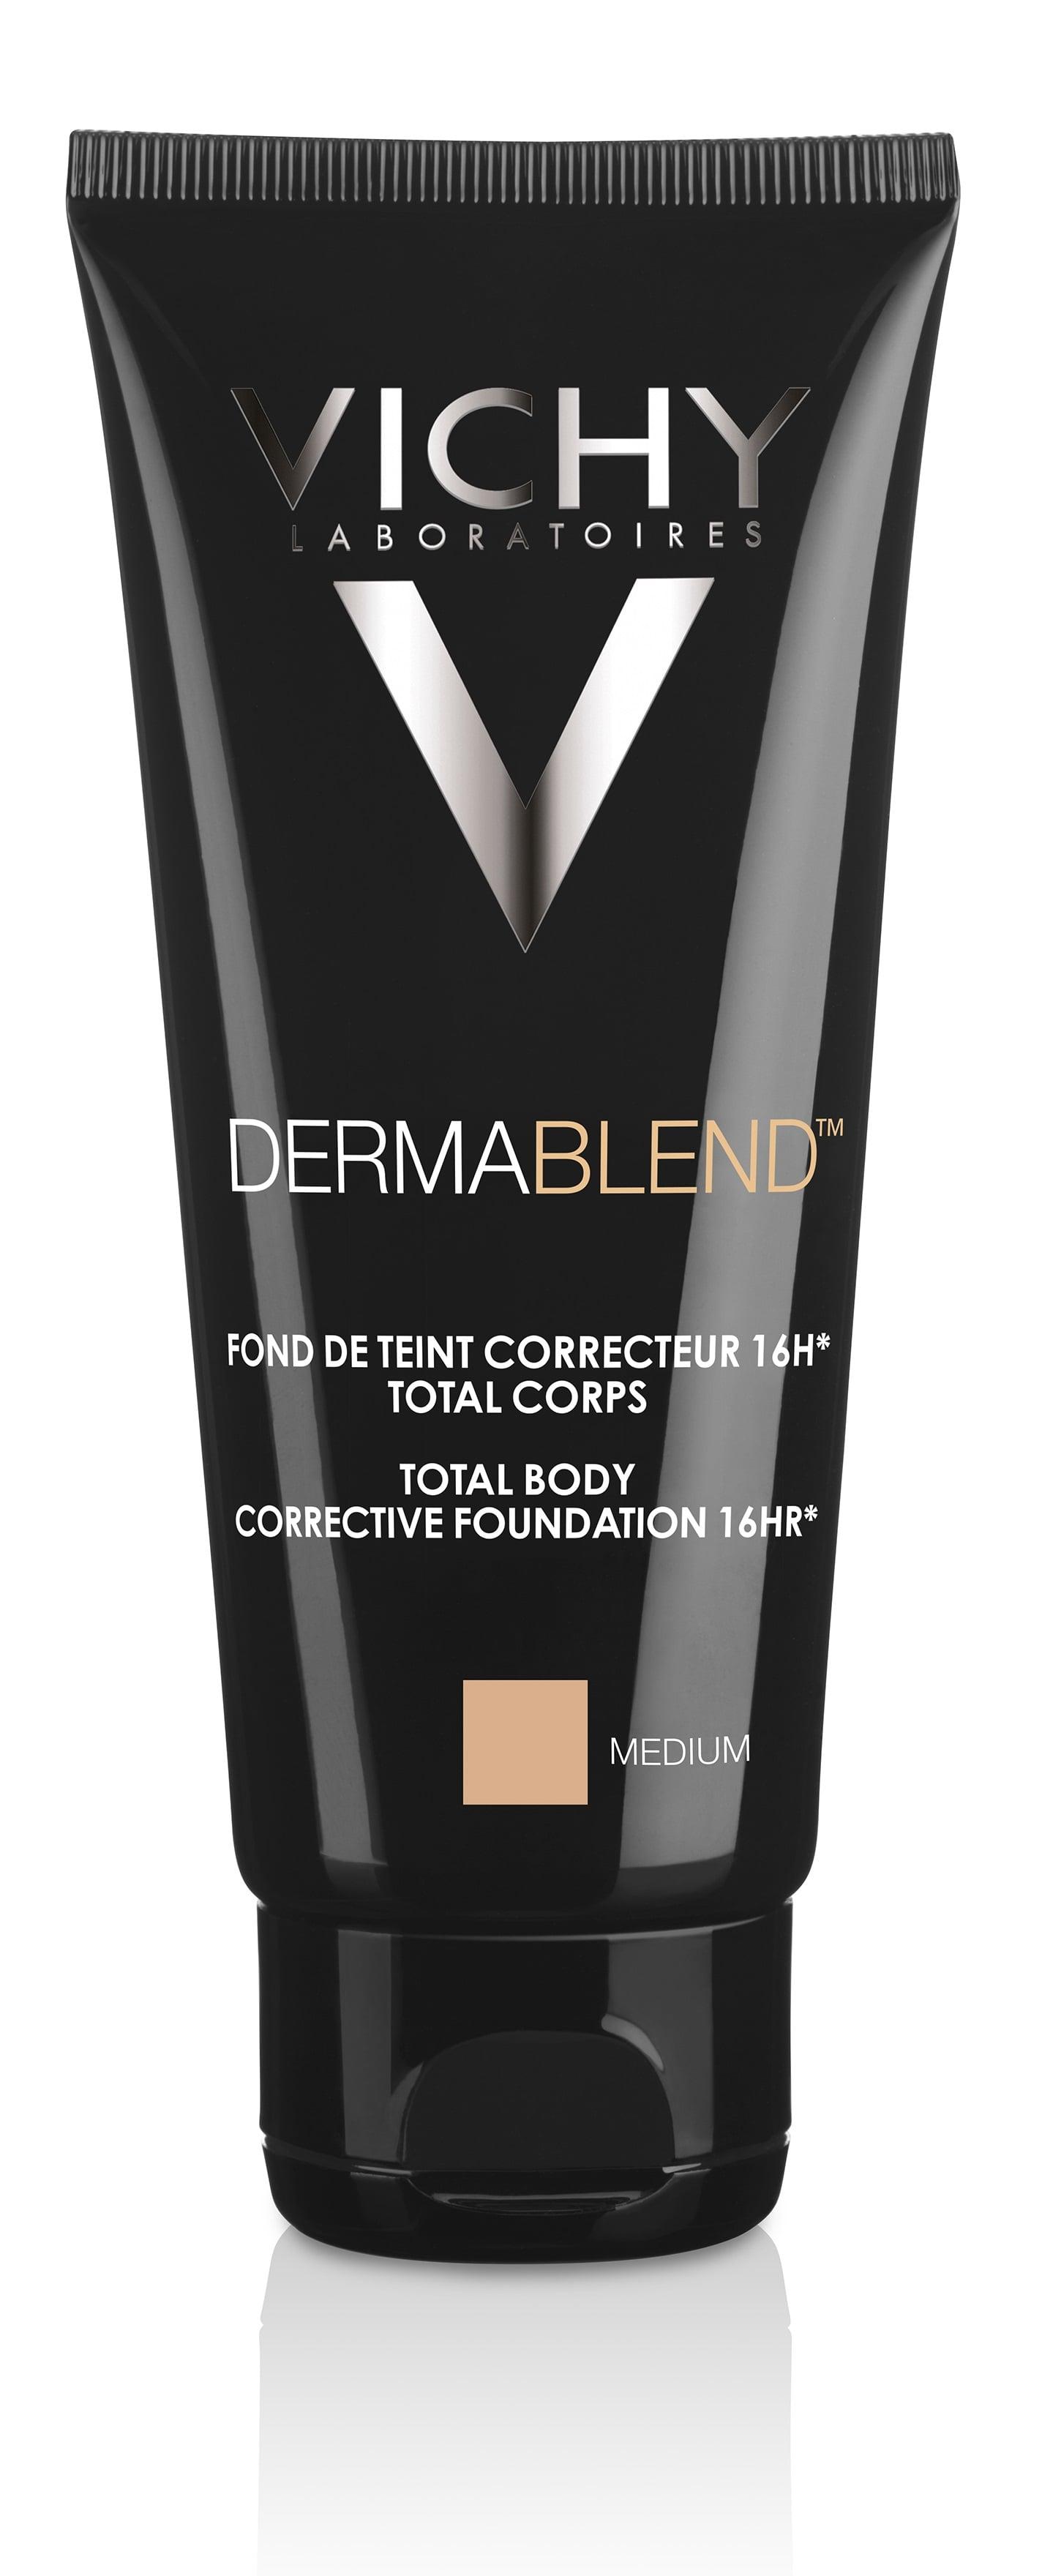 Vichy DERMABLEND Make-Up Total Body Corrective 16hrs SPF15, σε απόχρωση Medium, 100ml